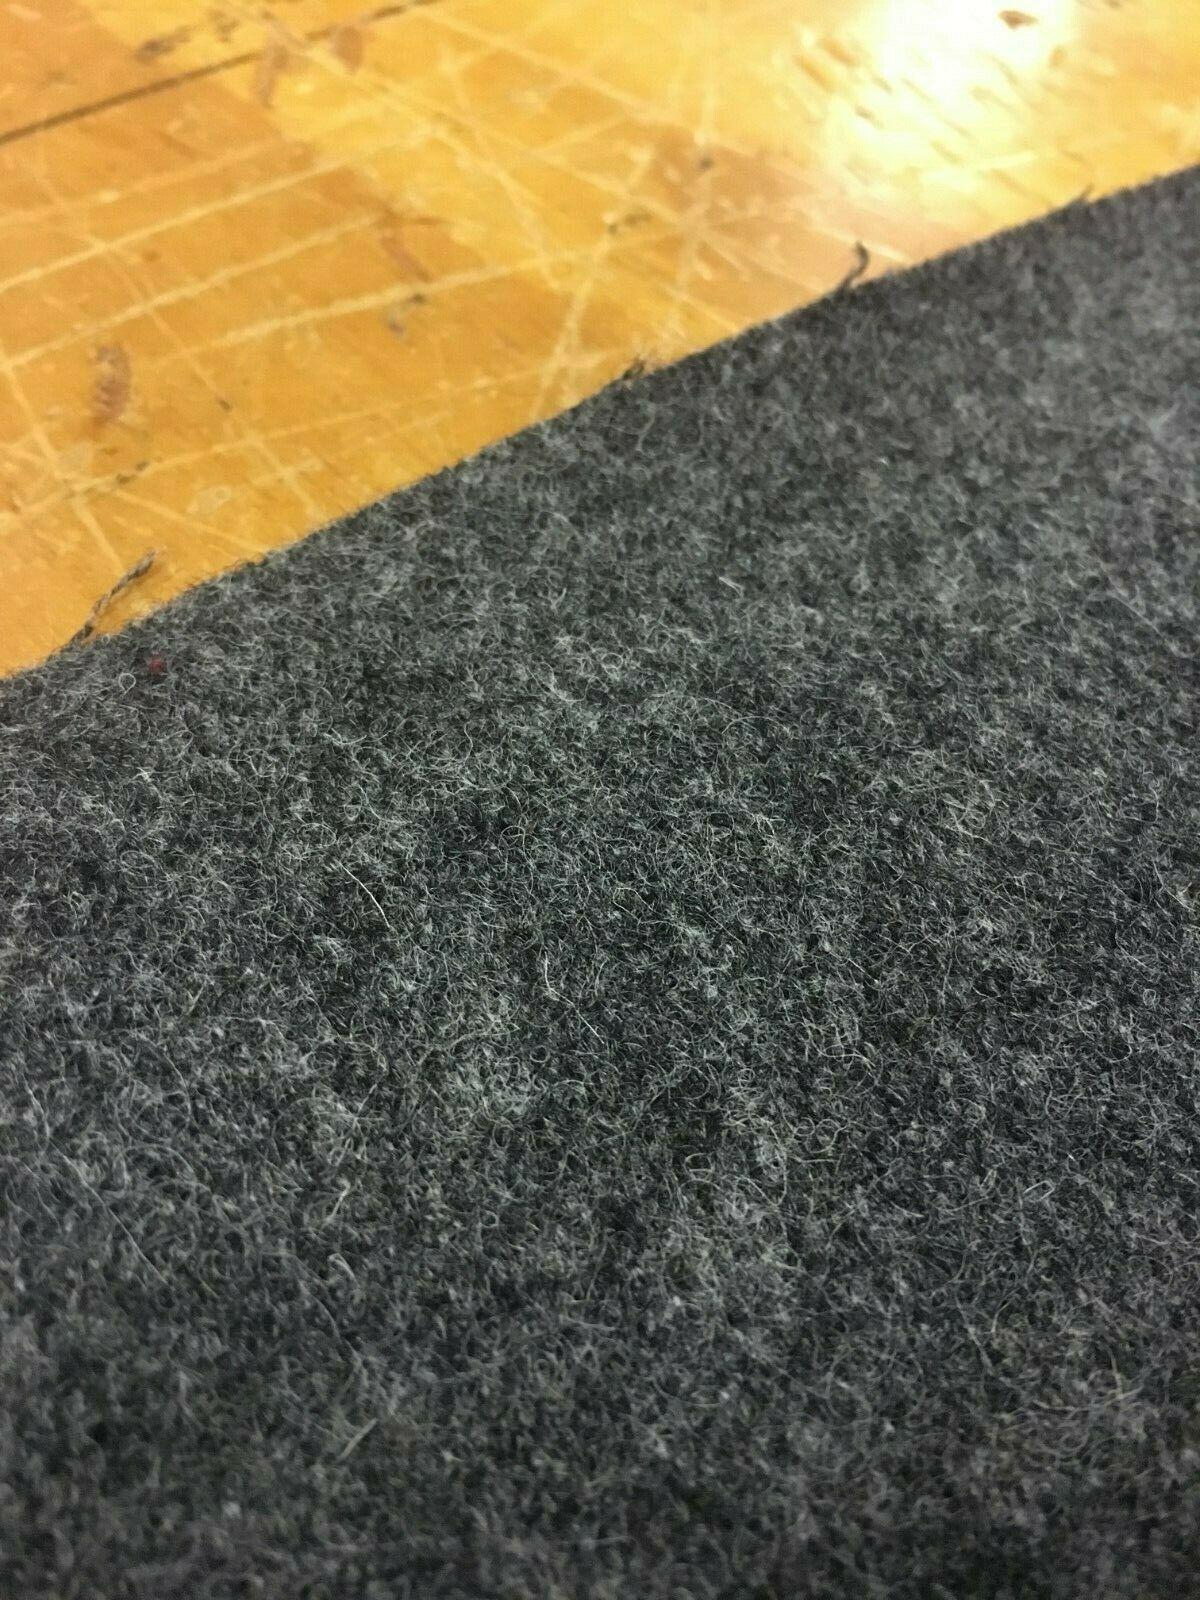 Mid Century Charcoal Gray Wool Upholstery Fabric 3.75 yards GX